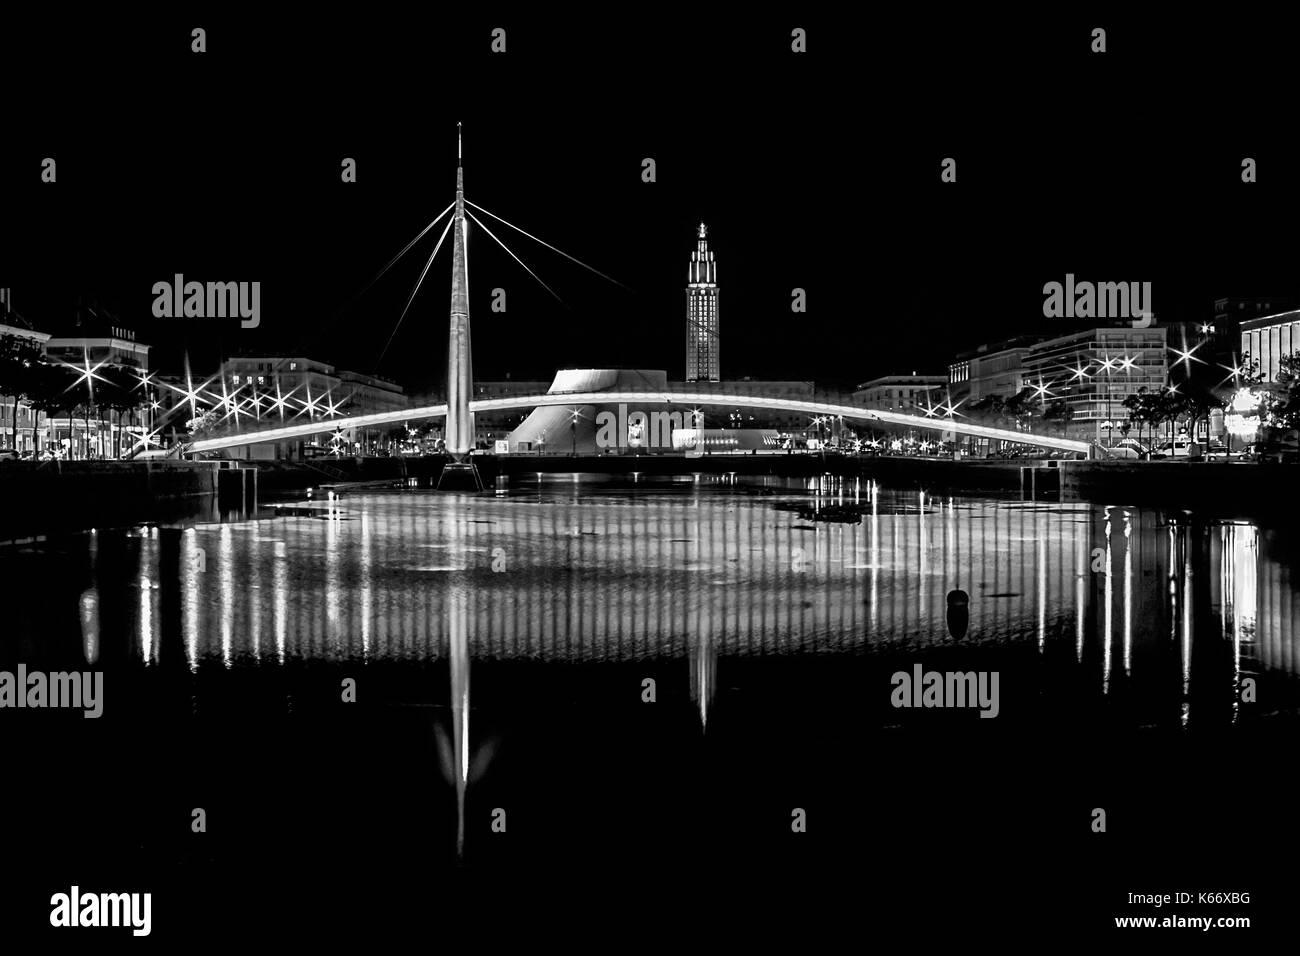 Bassin Du Commerce Bridge At Night In Le Havre, France (Black & White) - Stock Image